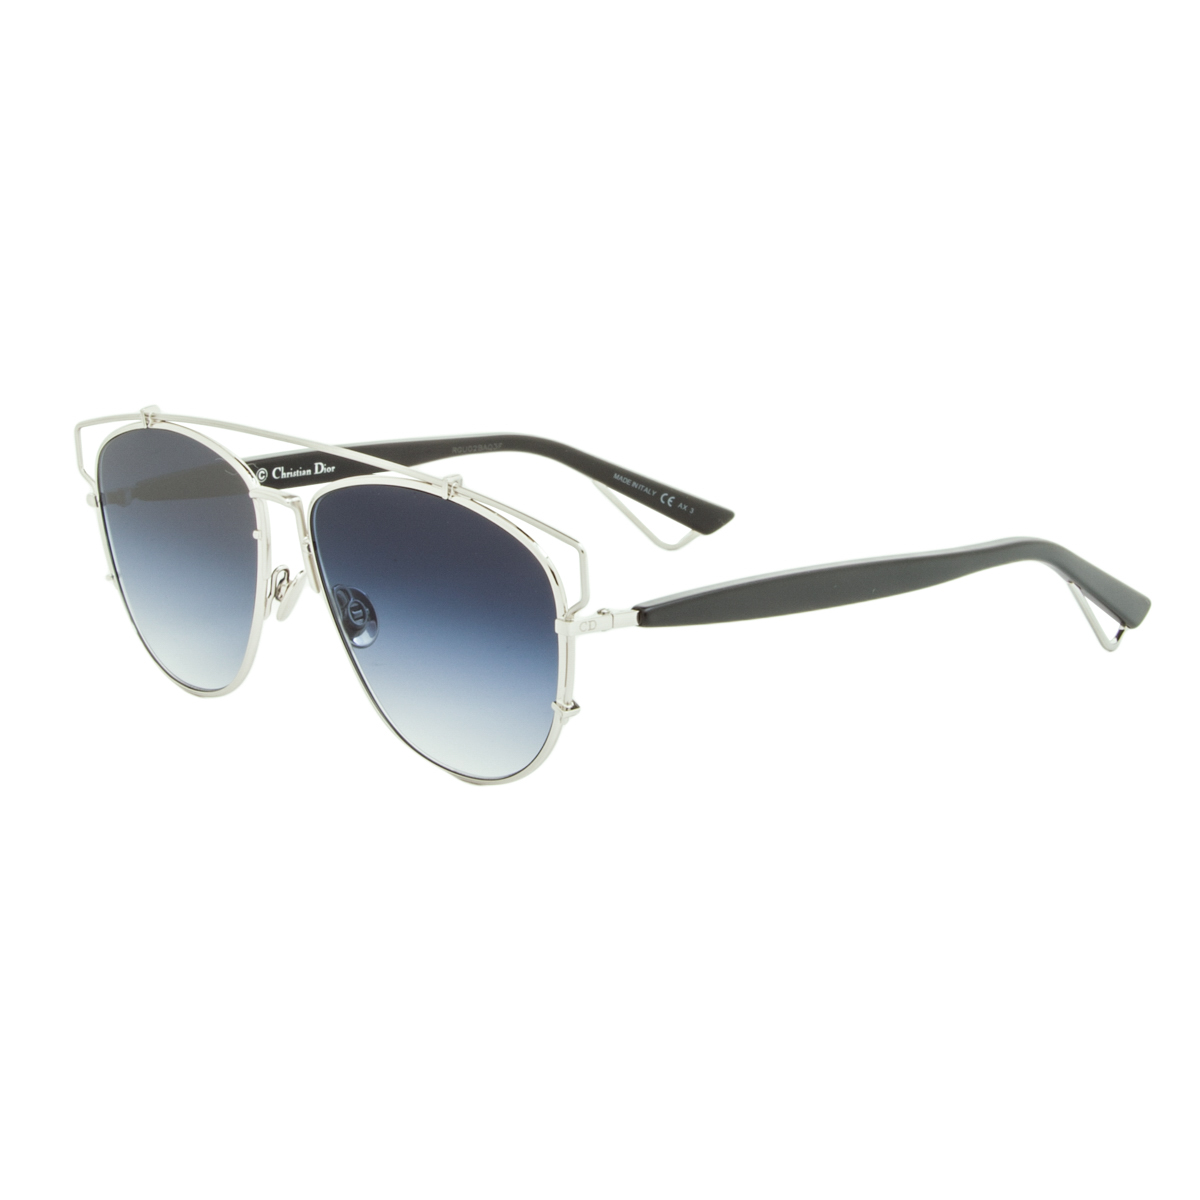 6703b857bea79 Details about Dior Technologic Womens Aviator Sunglasses 84J84 Silver Frame  Blue Gradient Lens